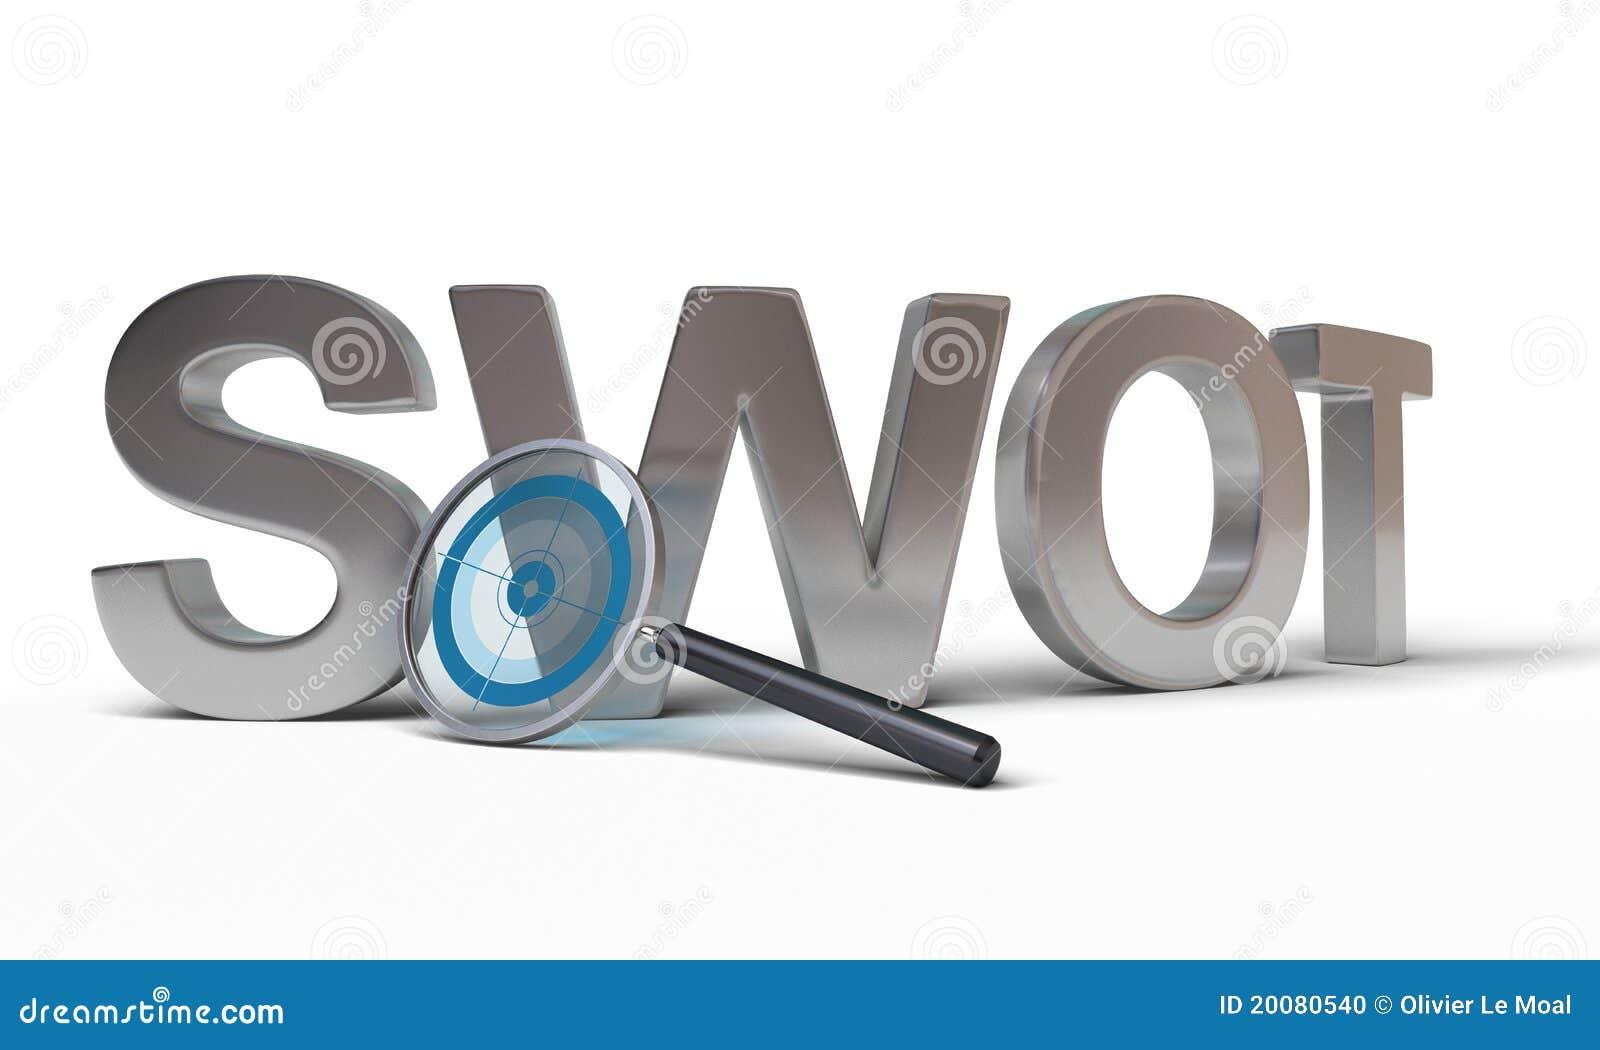 word 2007 swot analysis